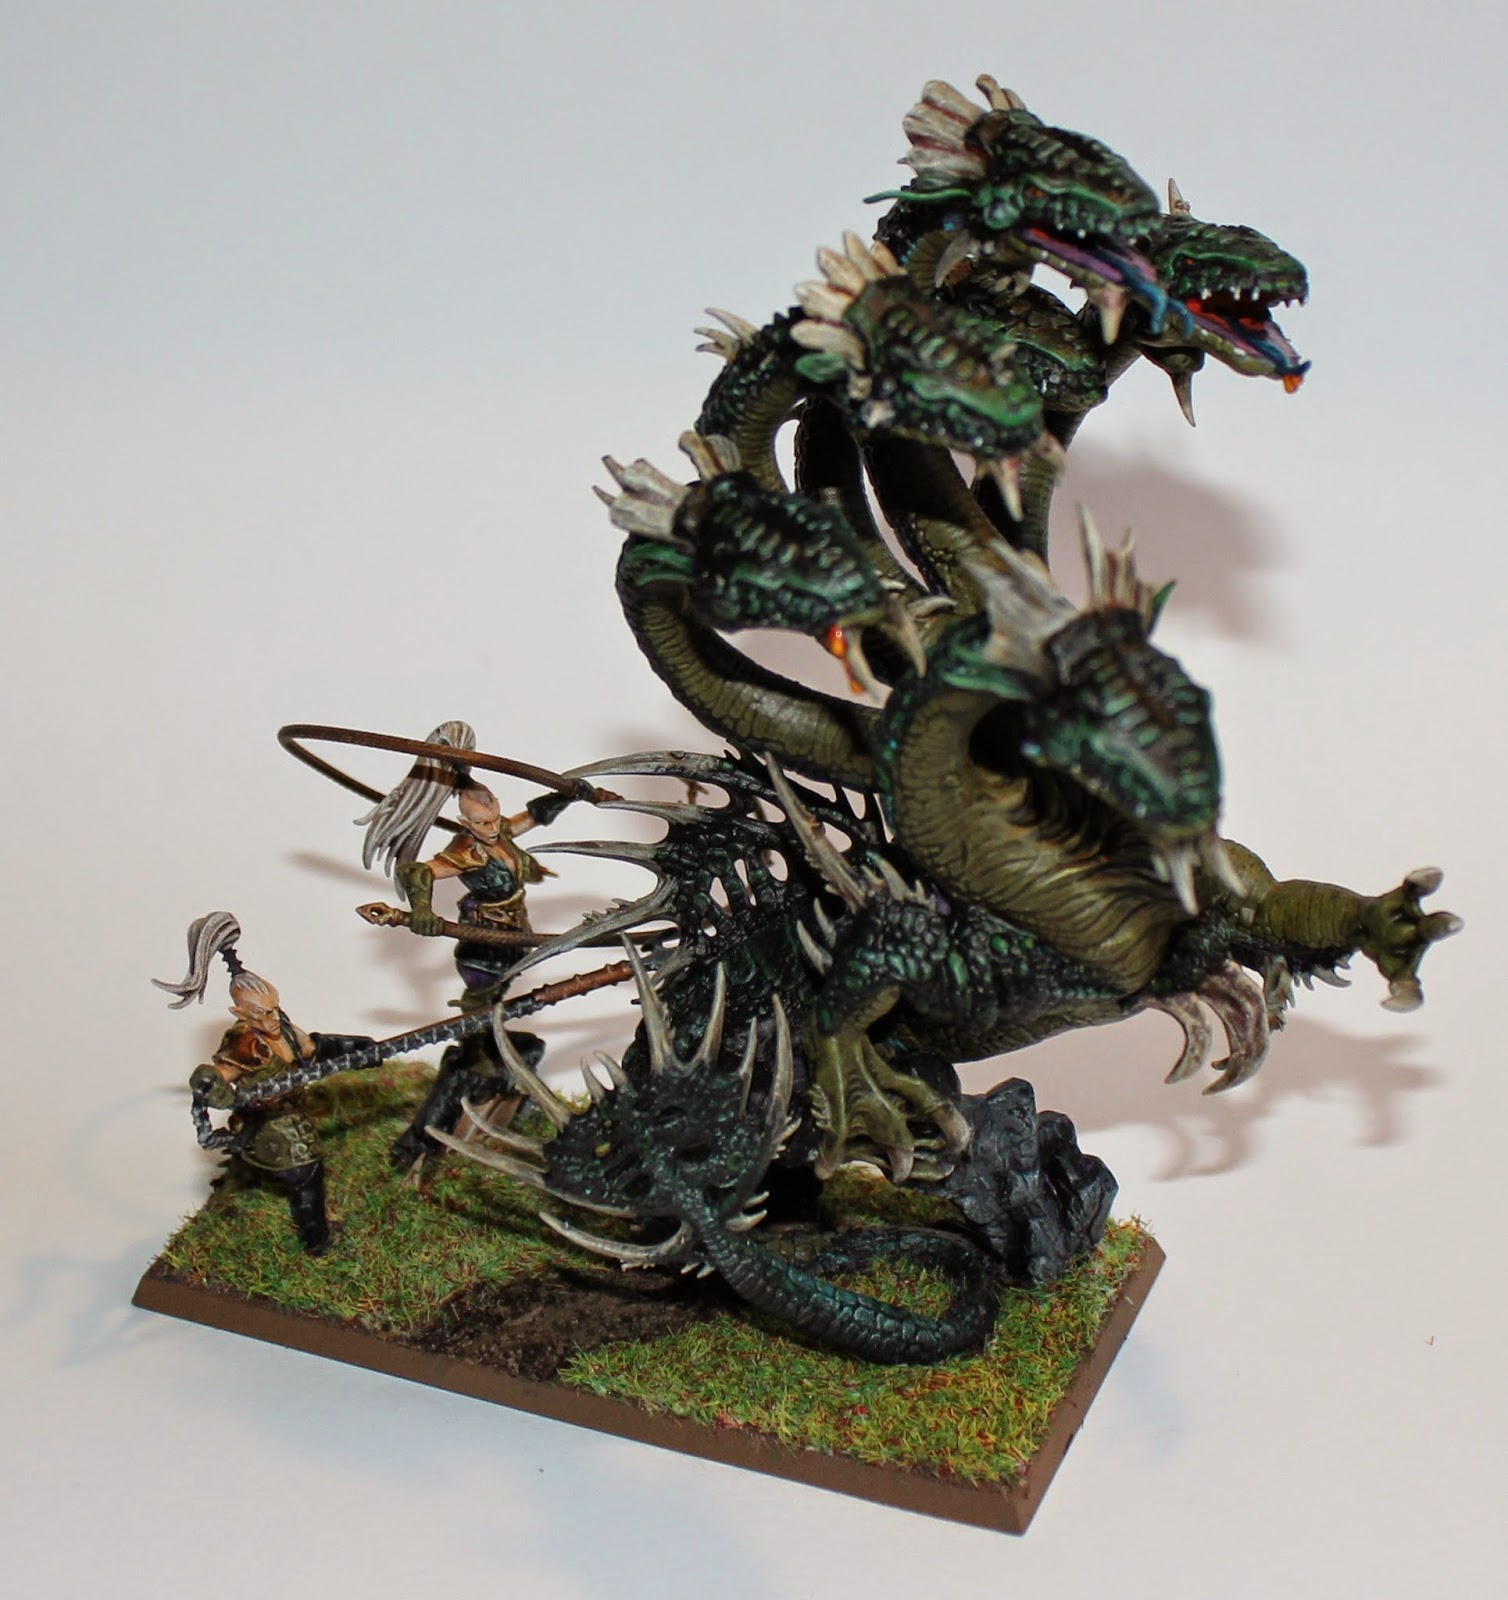 Hydra miniature